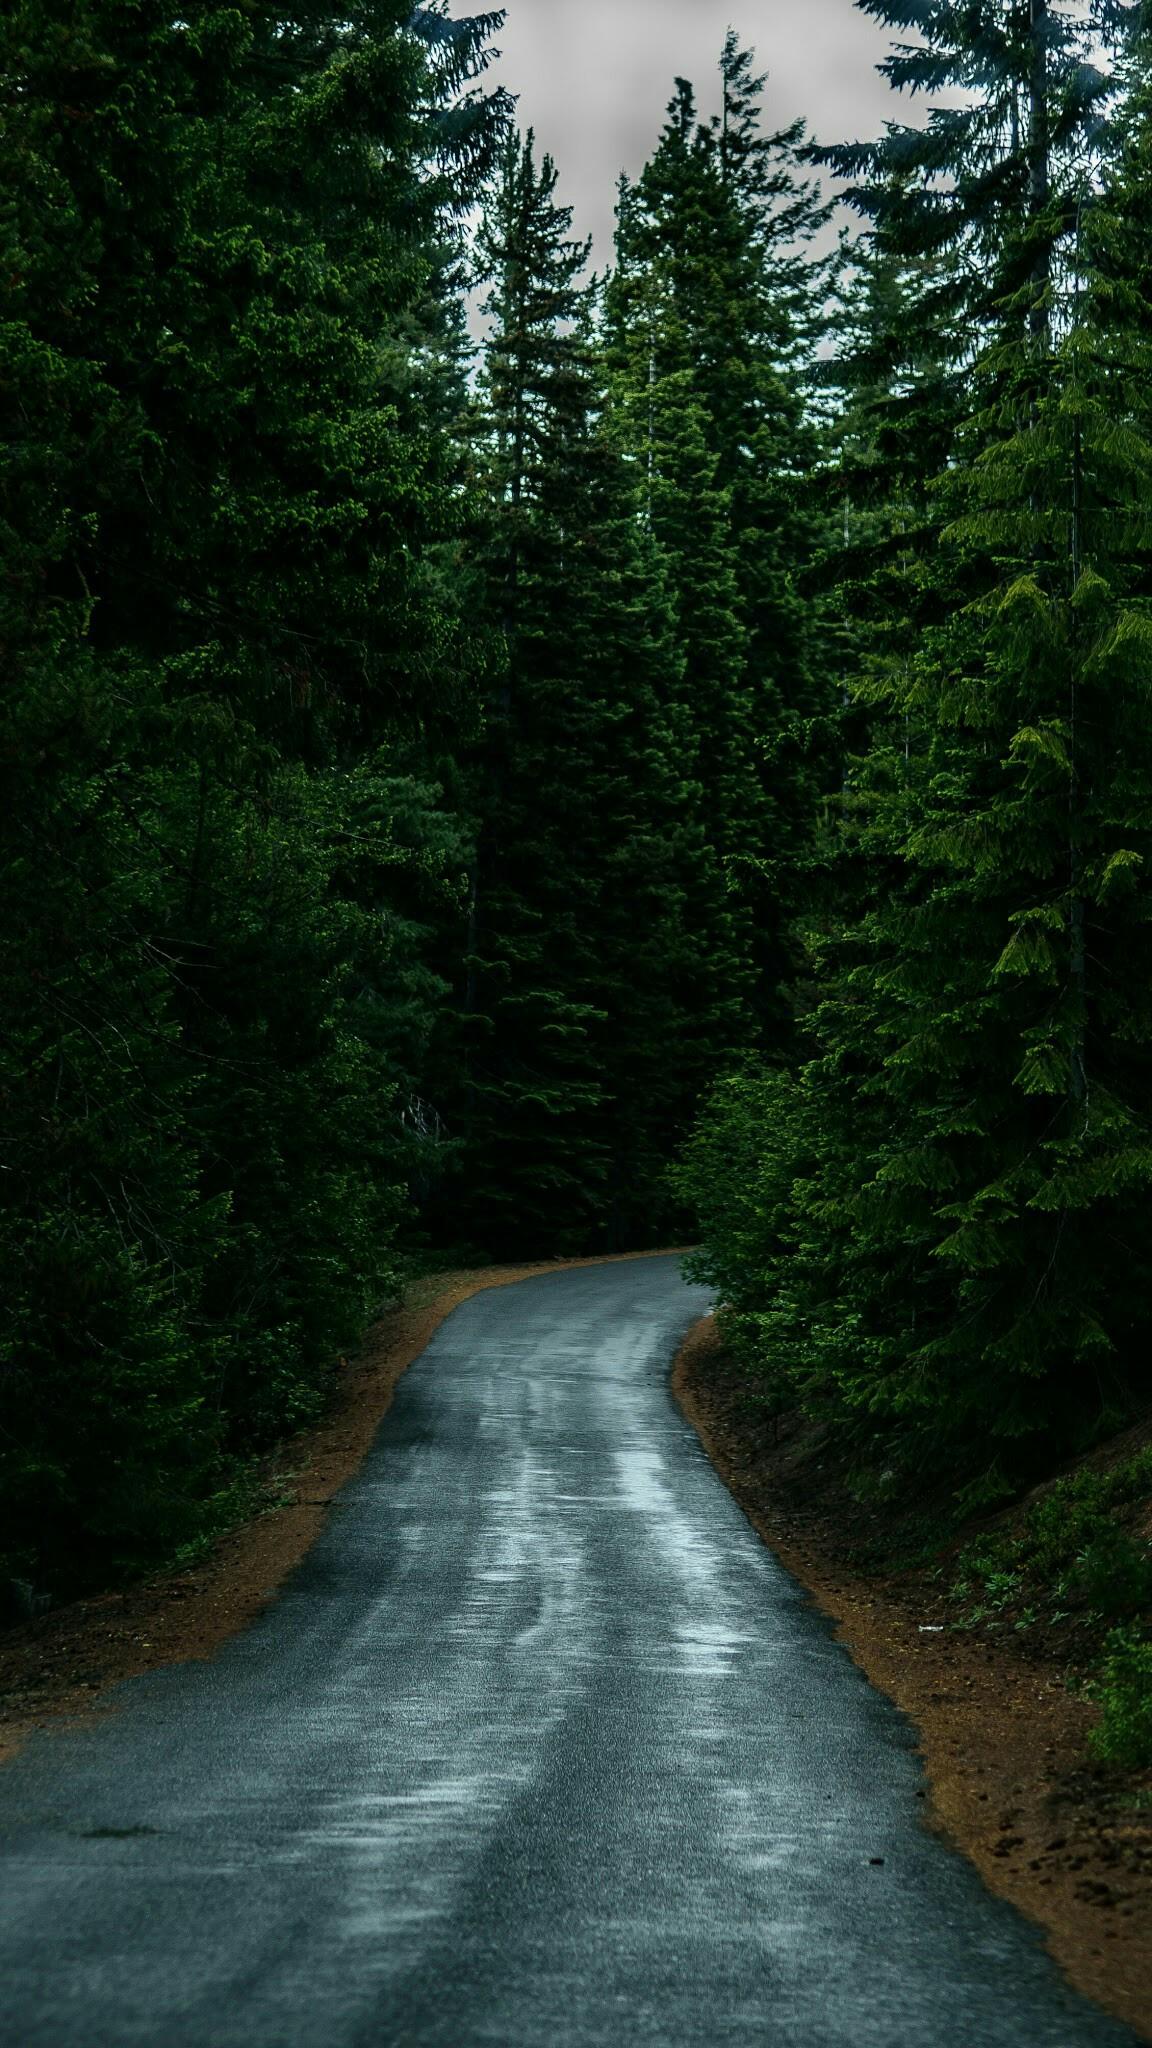 Road to Forest Dew iPhone Wallpaper iphoneswallpapers com